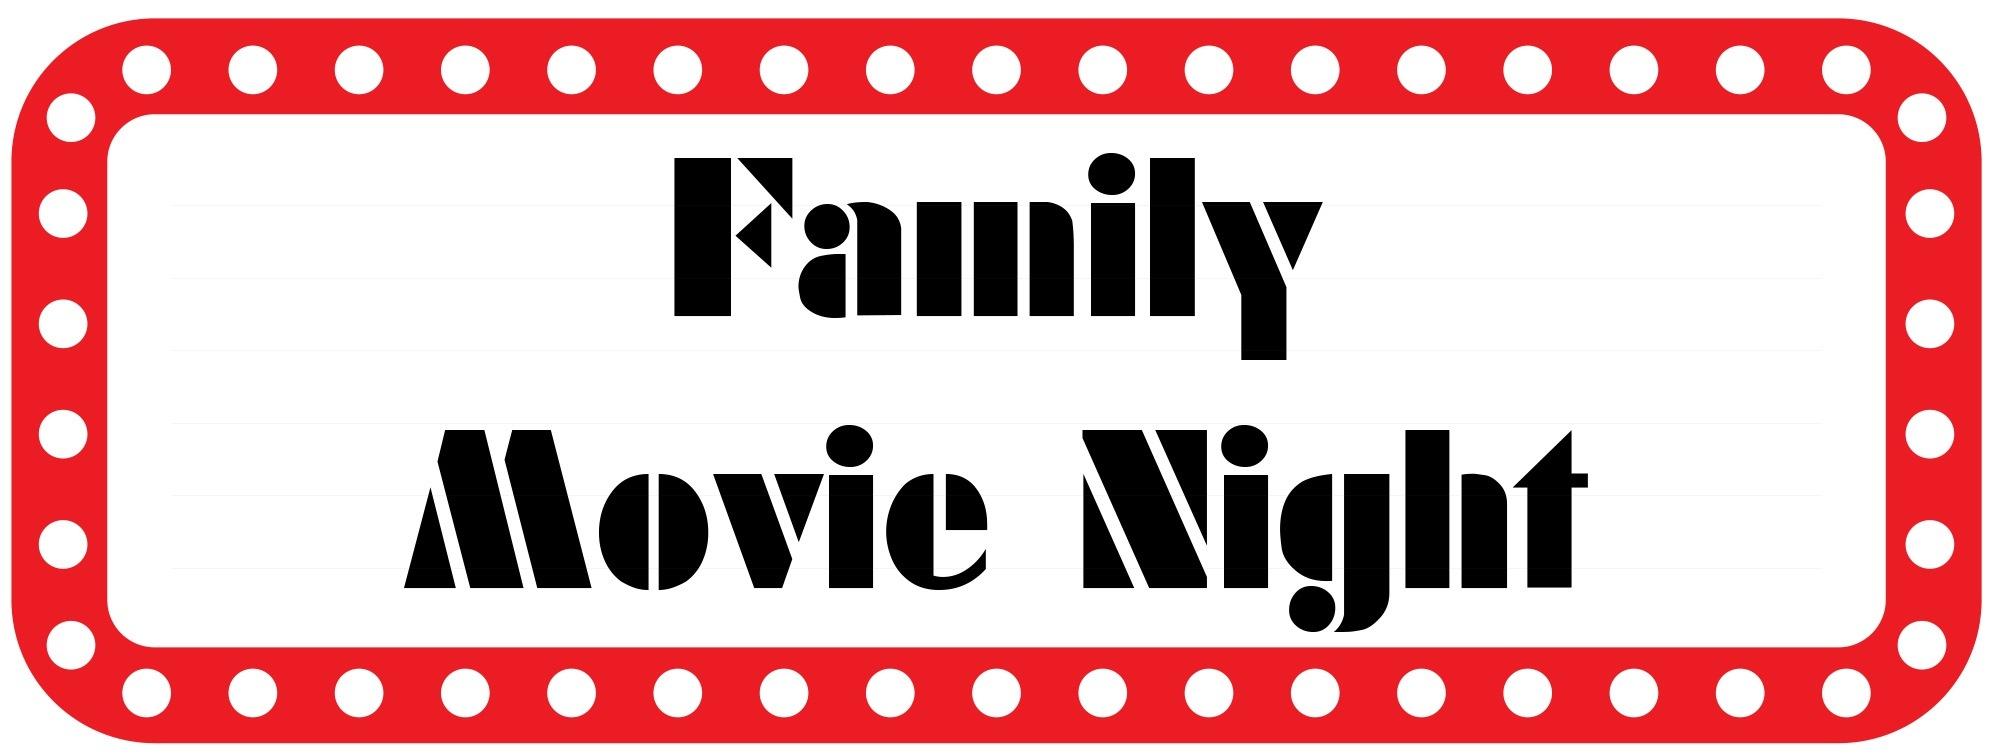 movie night clipart clipground movie ticket clip art carnival movie ticket clip art image